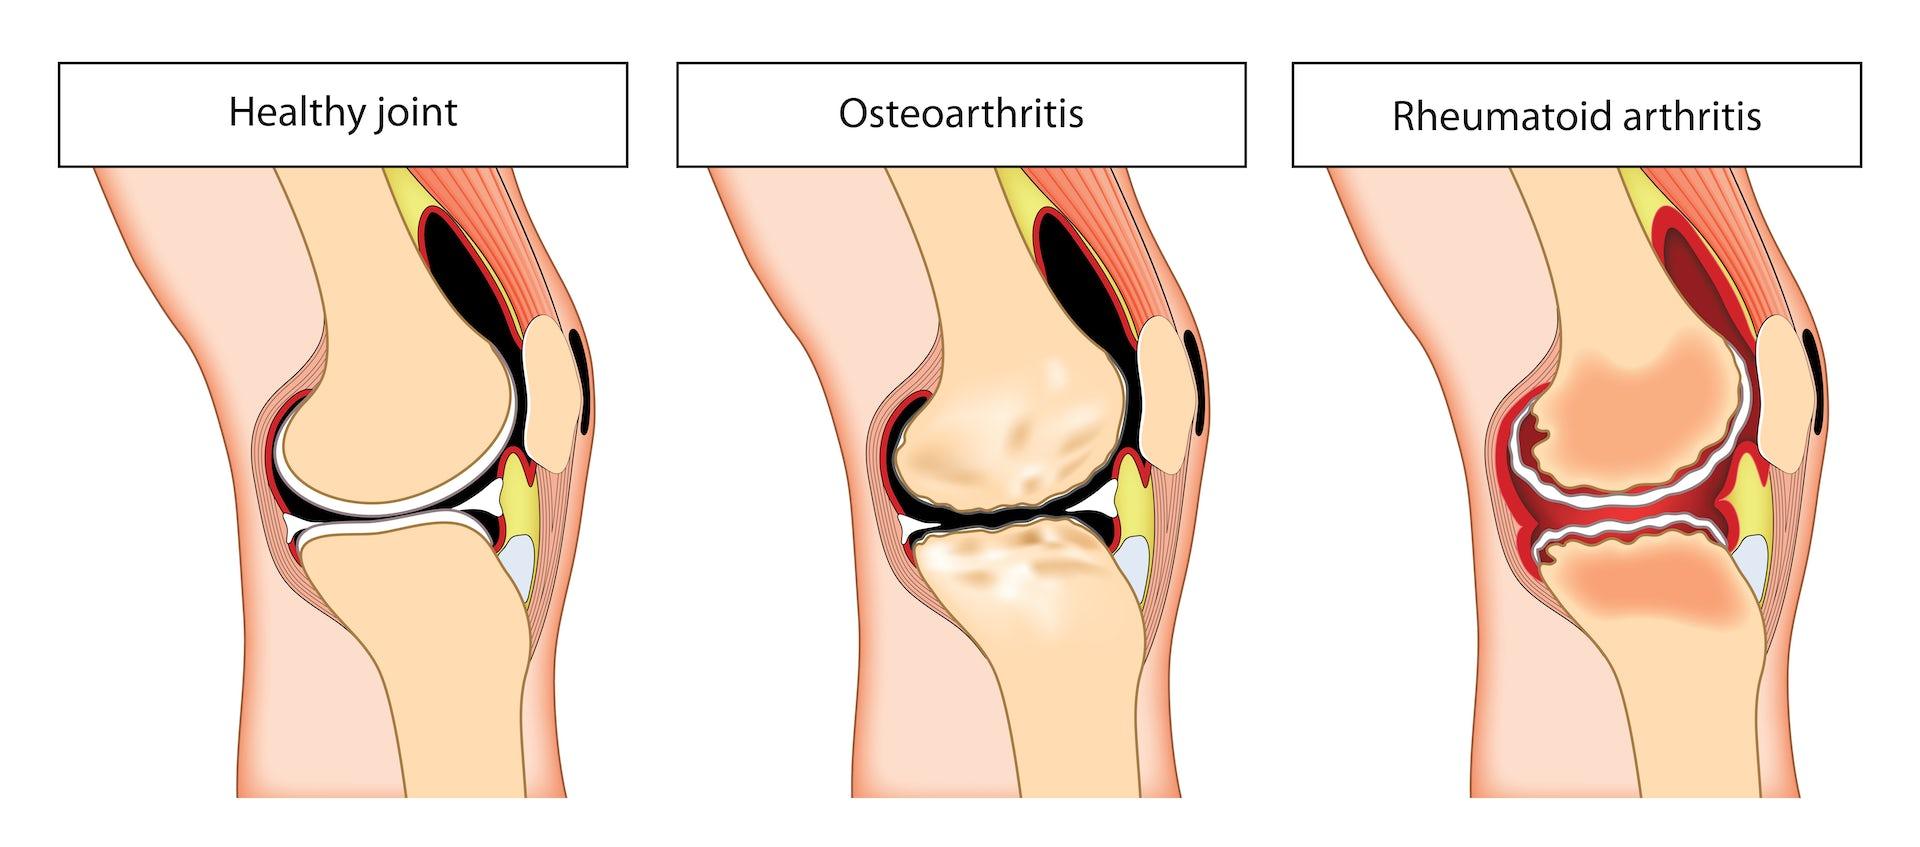 Types Of Arthritis Blamb Shutterstock